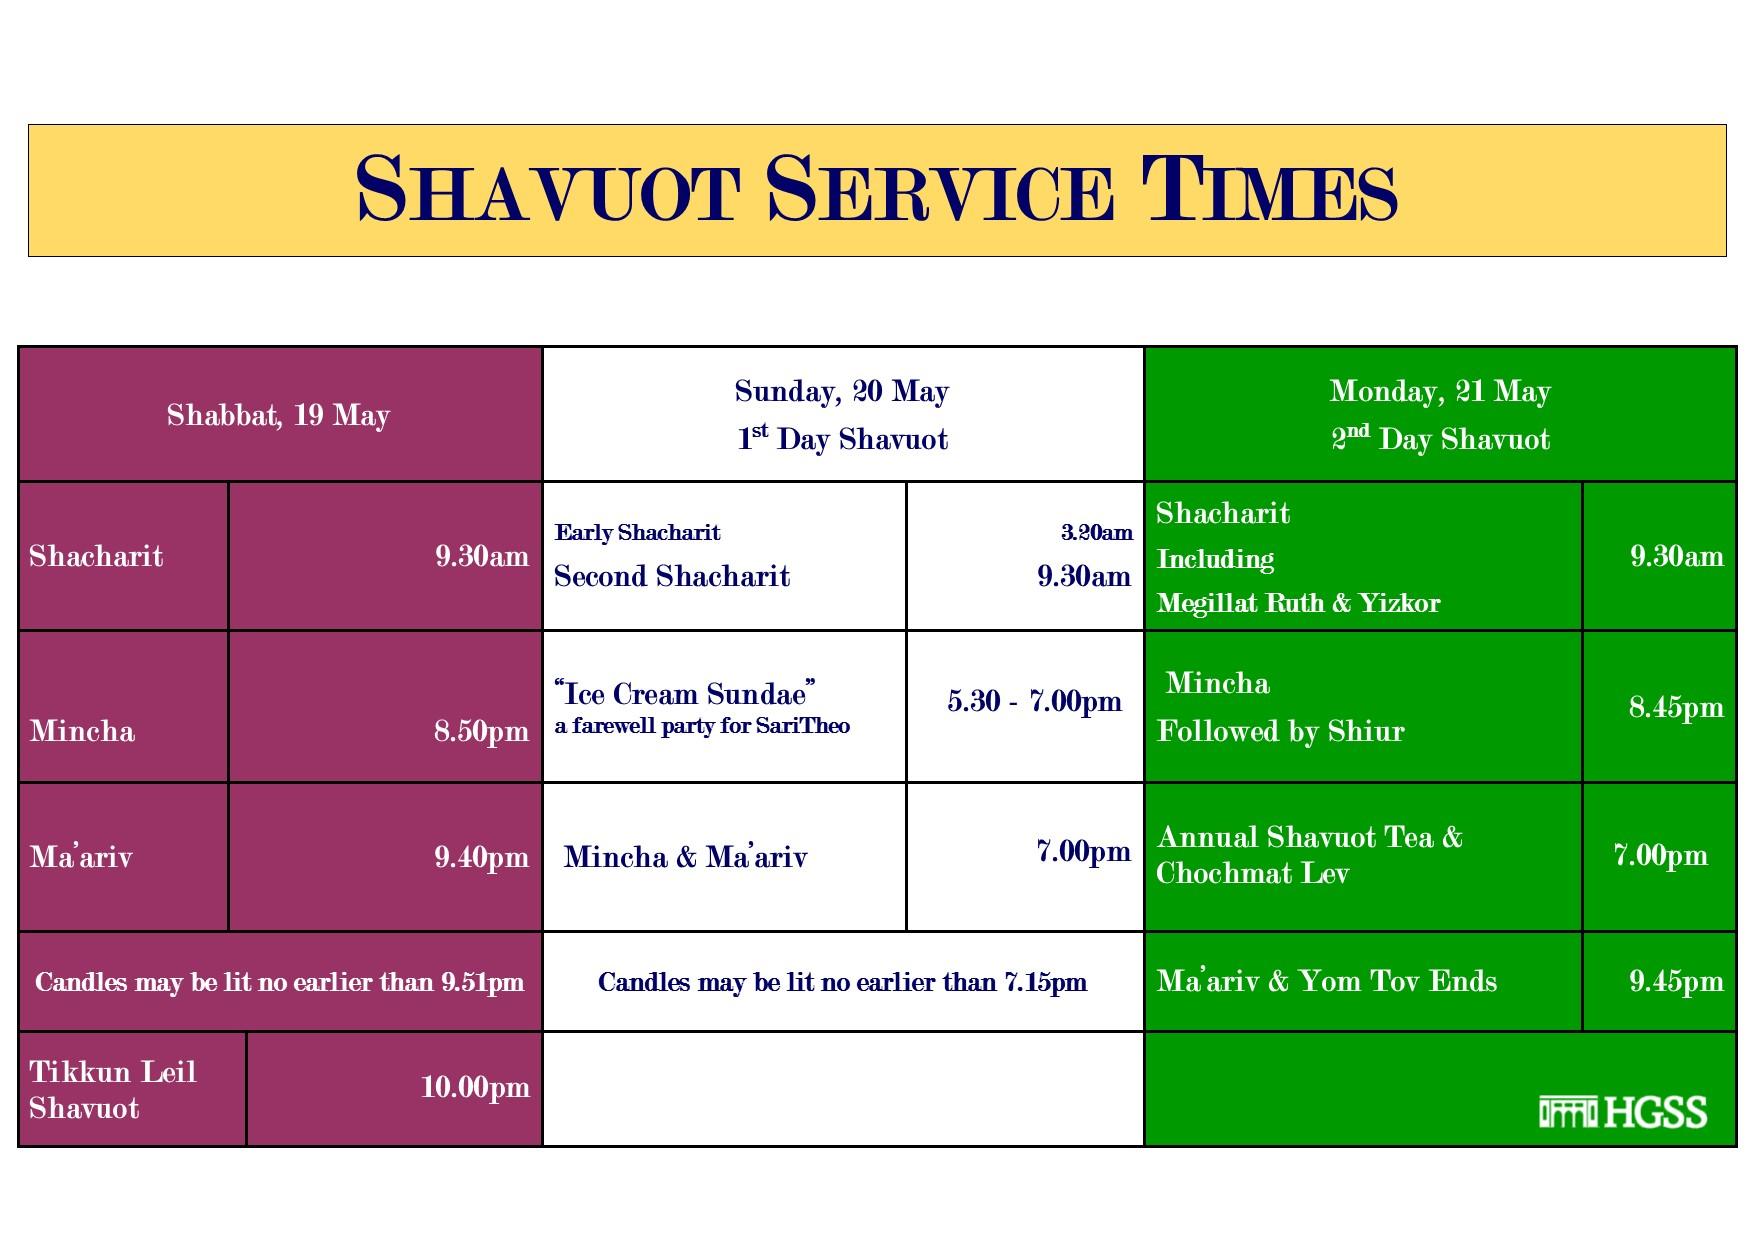 Shavuot 2 @ Jewish Holidays